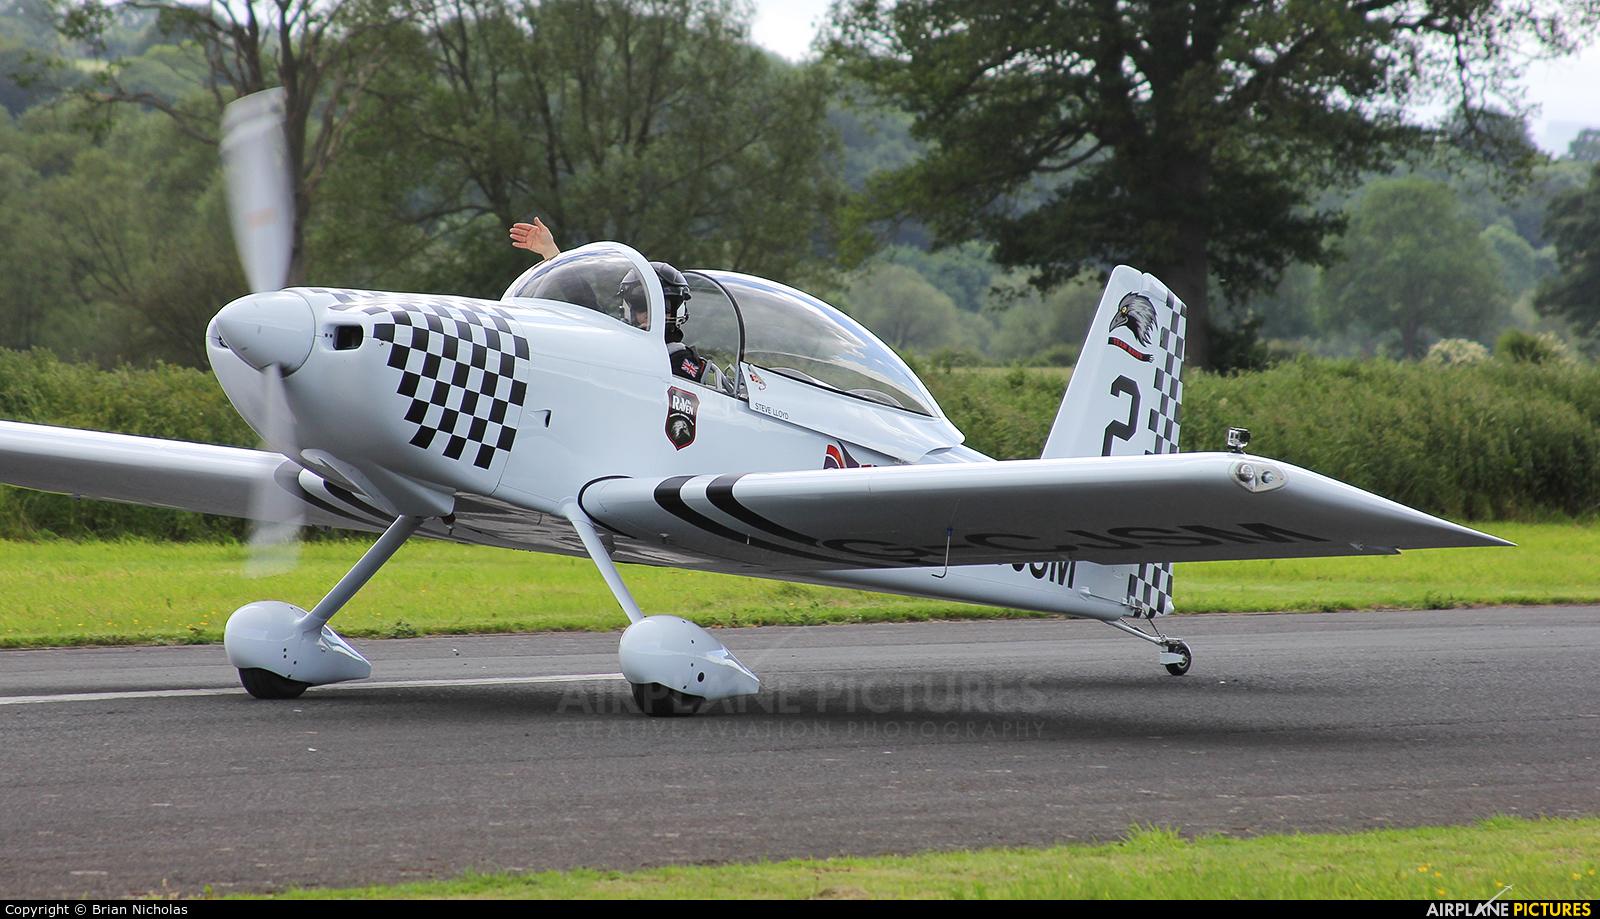 Team Raven G-CJSM aircraft at Welshpool